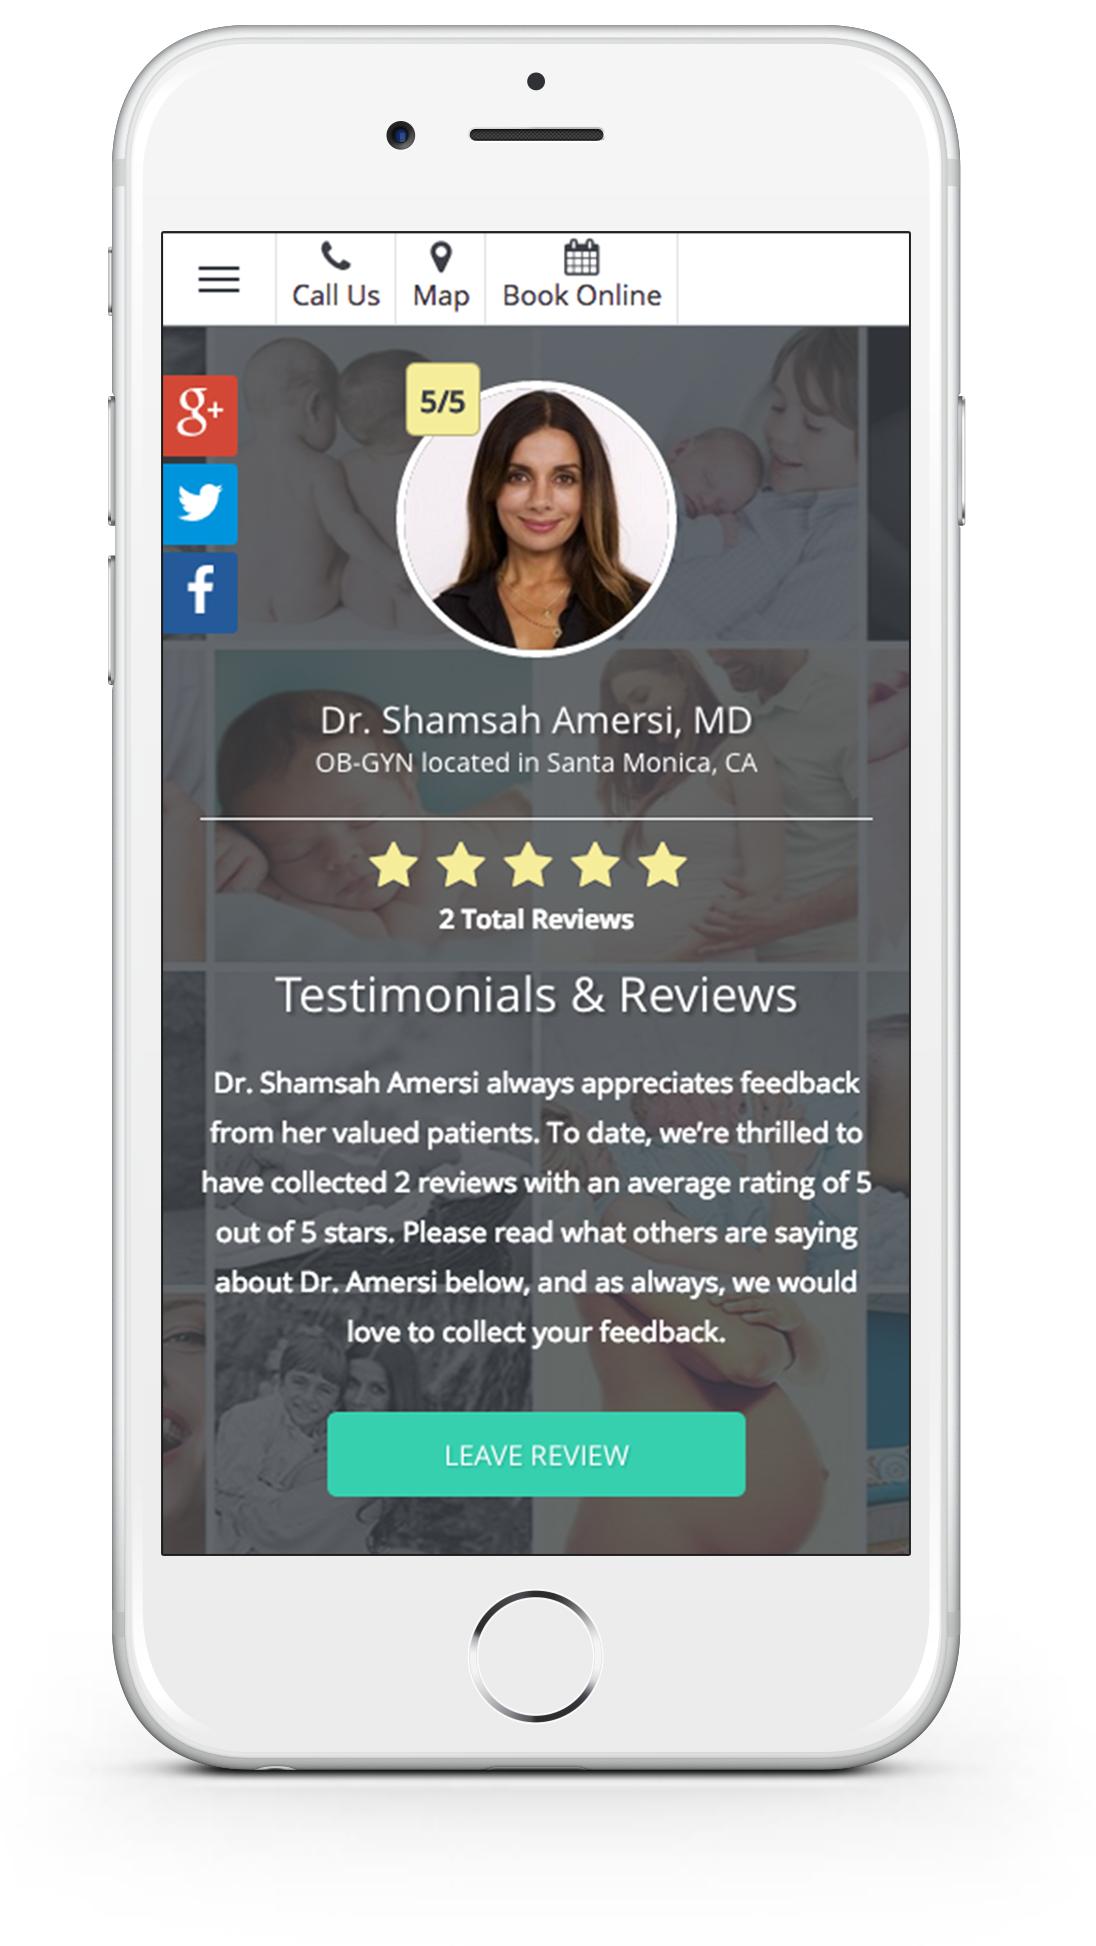 PatientPop - Follow up survey